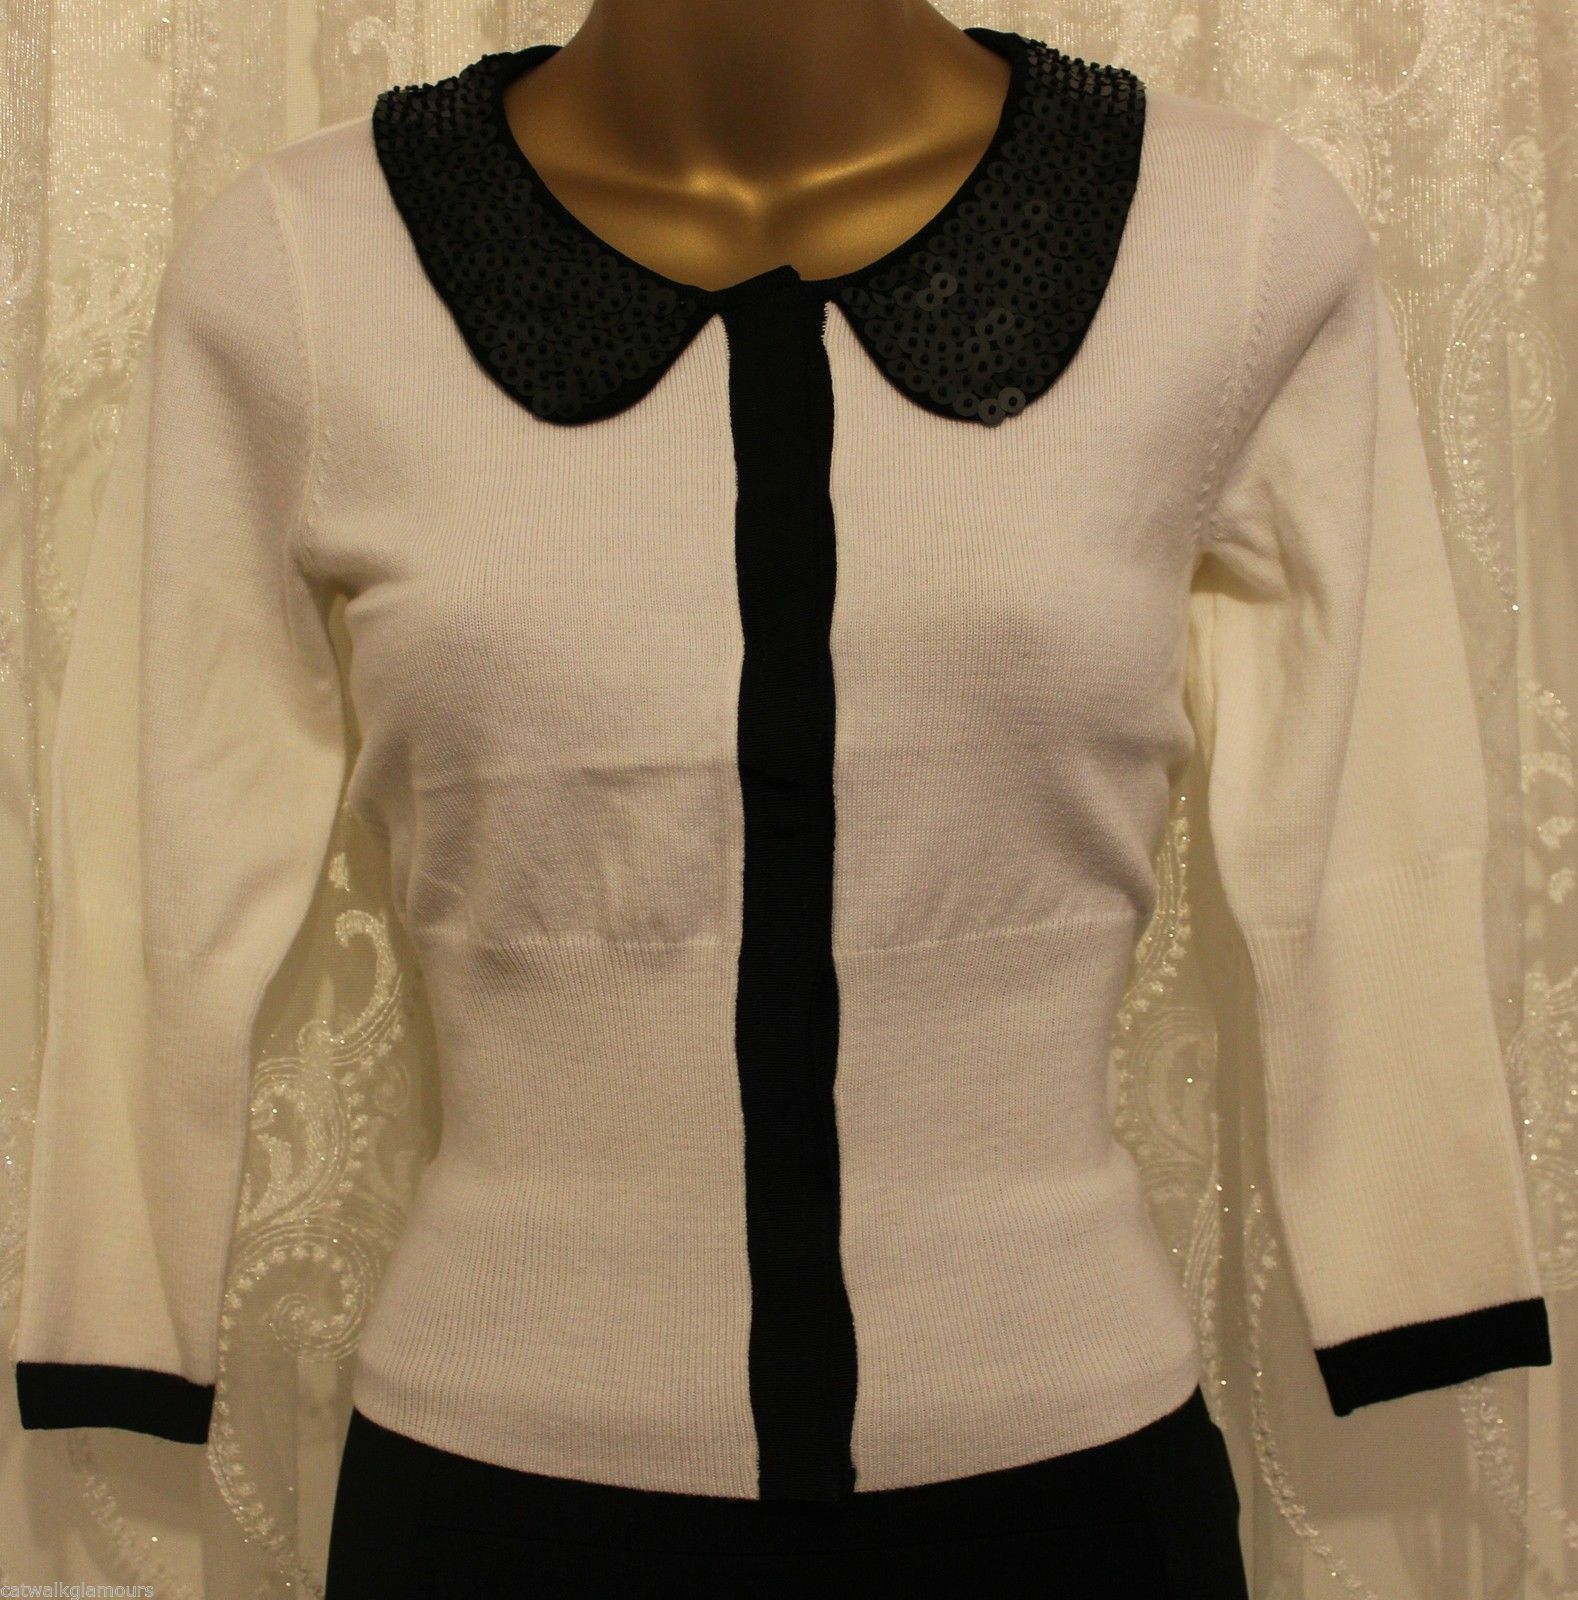 Karen Millen Peter Pan Collar Tailored Knit Cardigan Wool Jumper  8 10 12